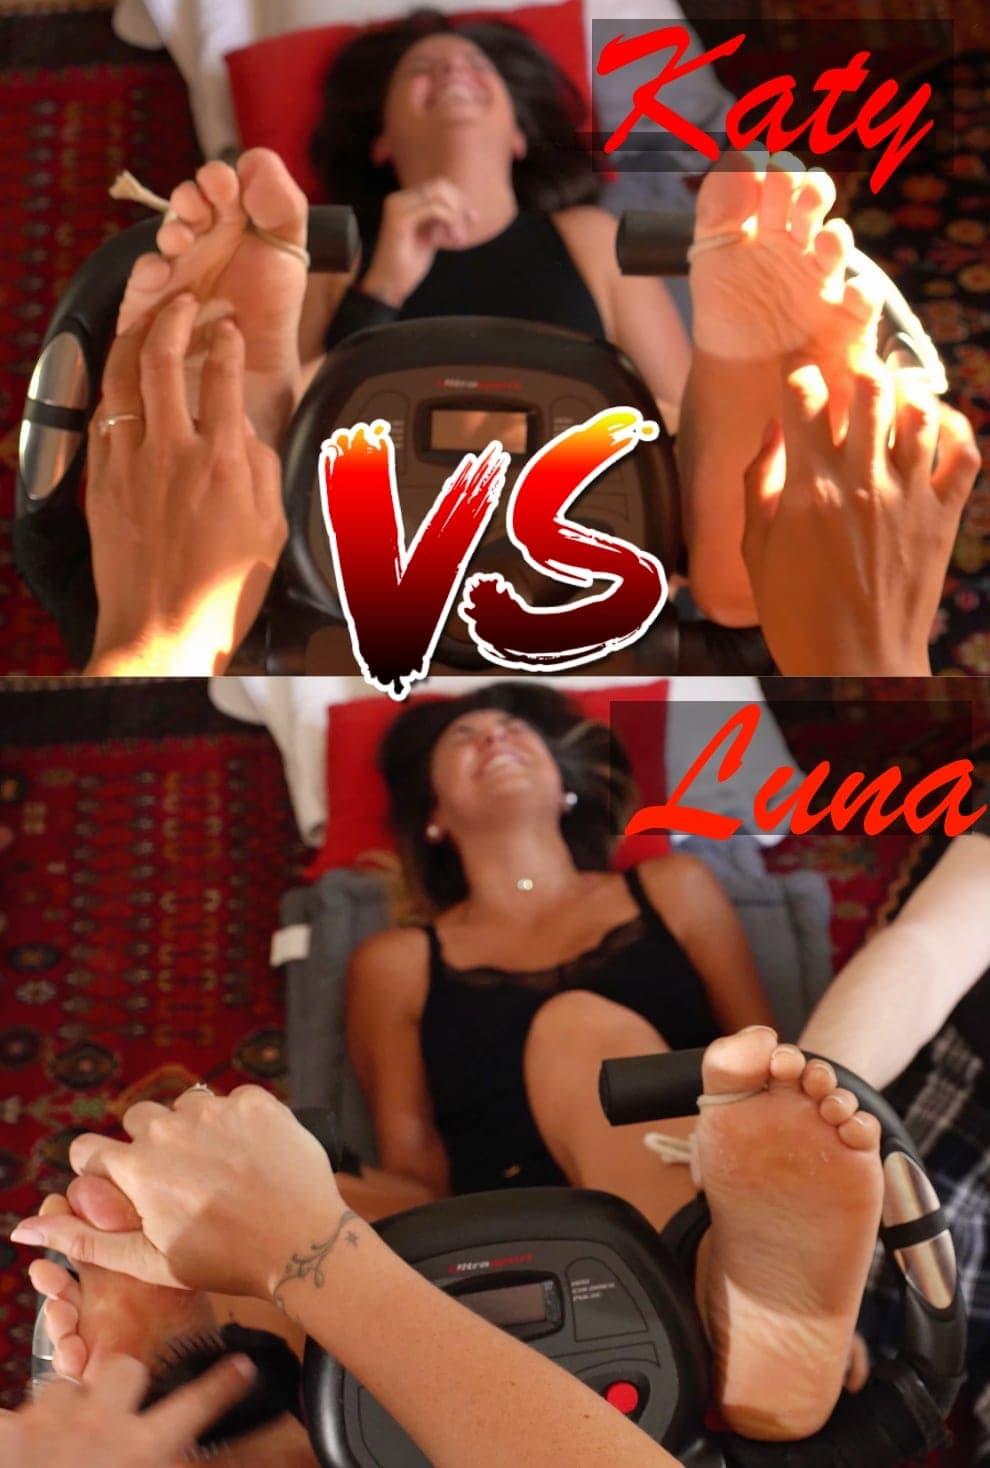 Luna vs Katy : Who is the most sadistic ?